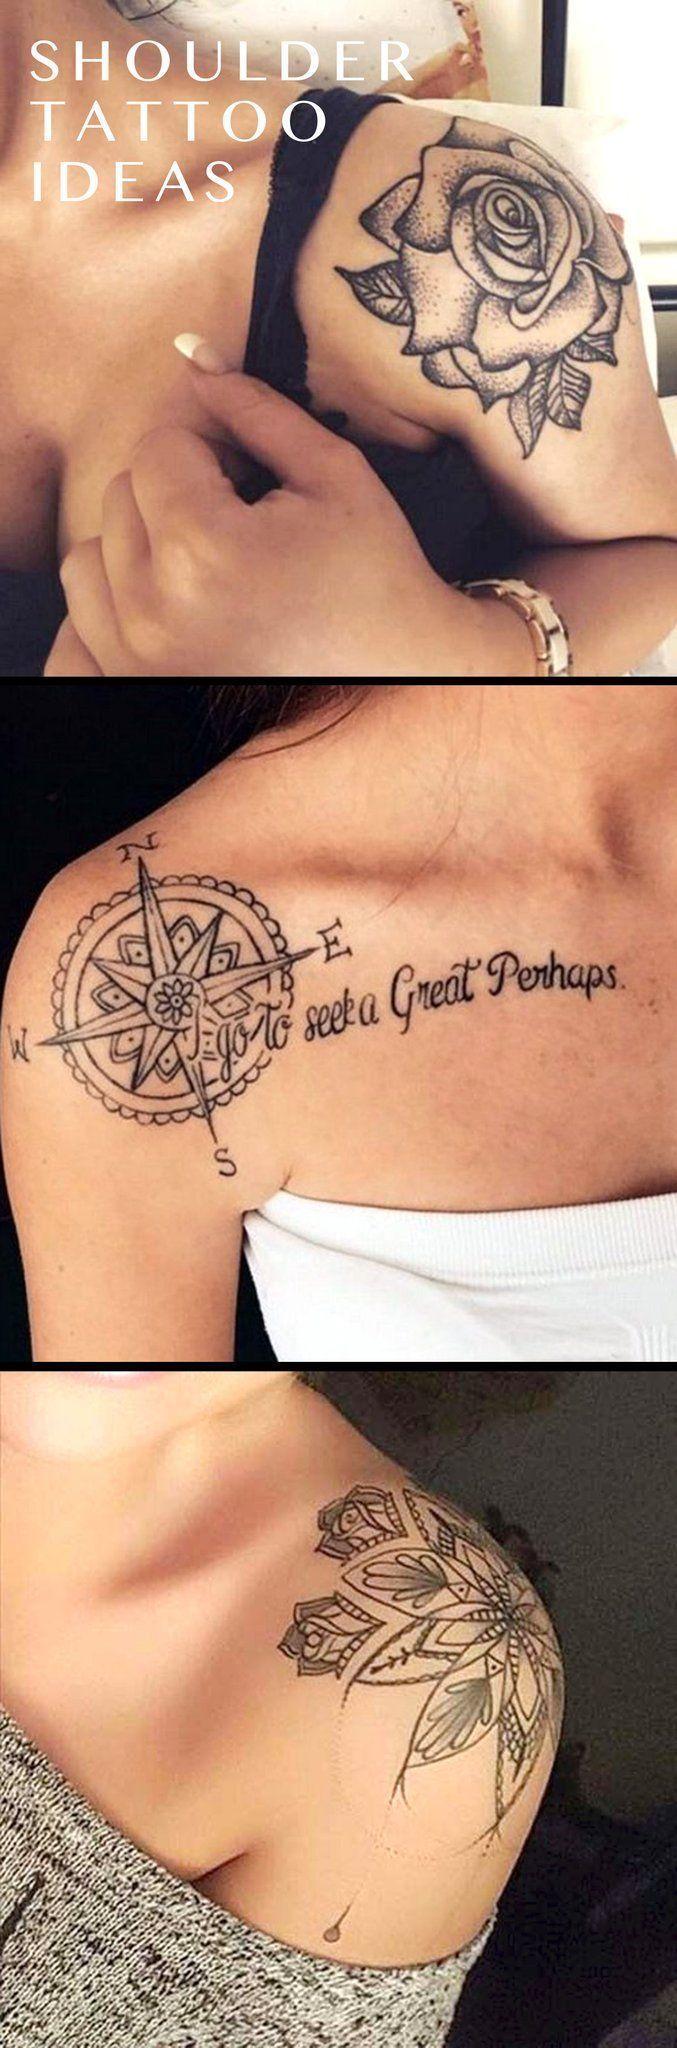 Trendy cute shoulder tattoo ideas for women geometric mandala